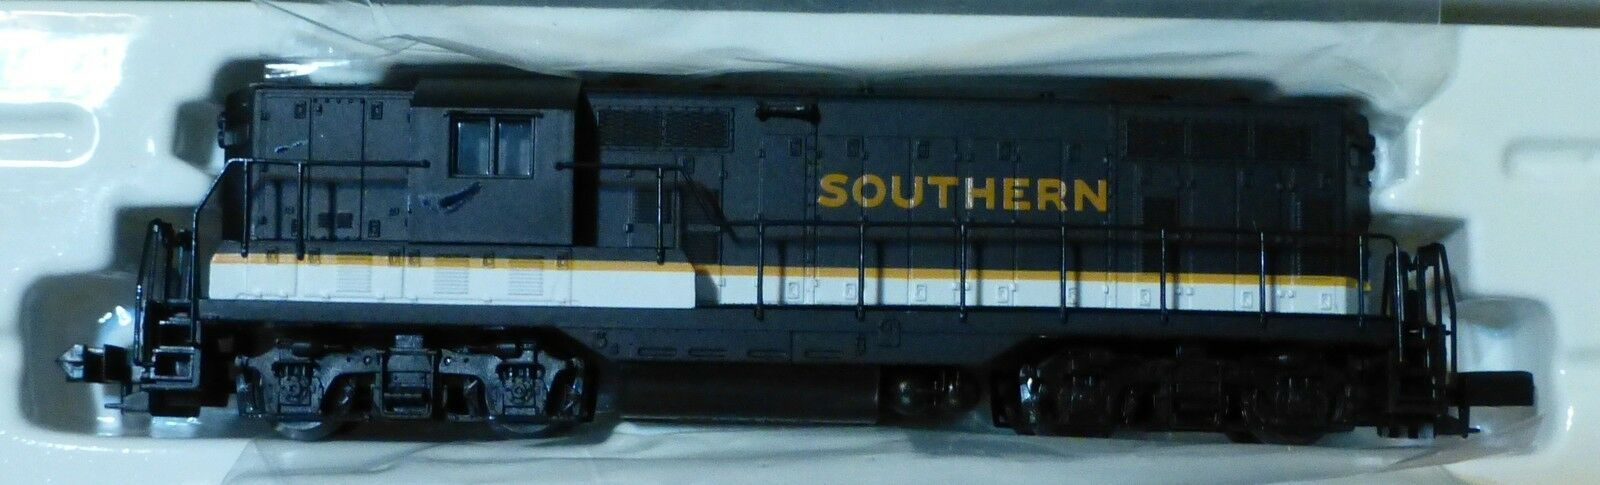 Atlas N GP-7 Ph. Ph. Ph. 2 Southern No No D B (Locomotive) DC 867c7d